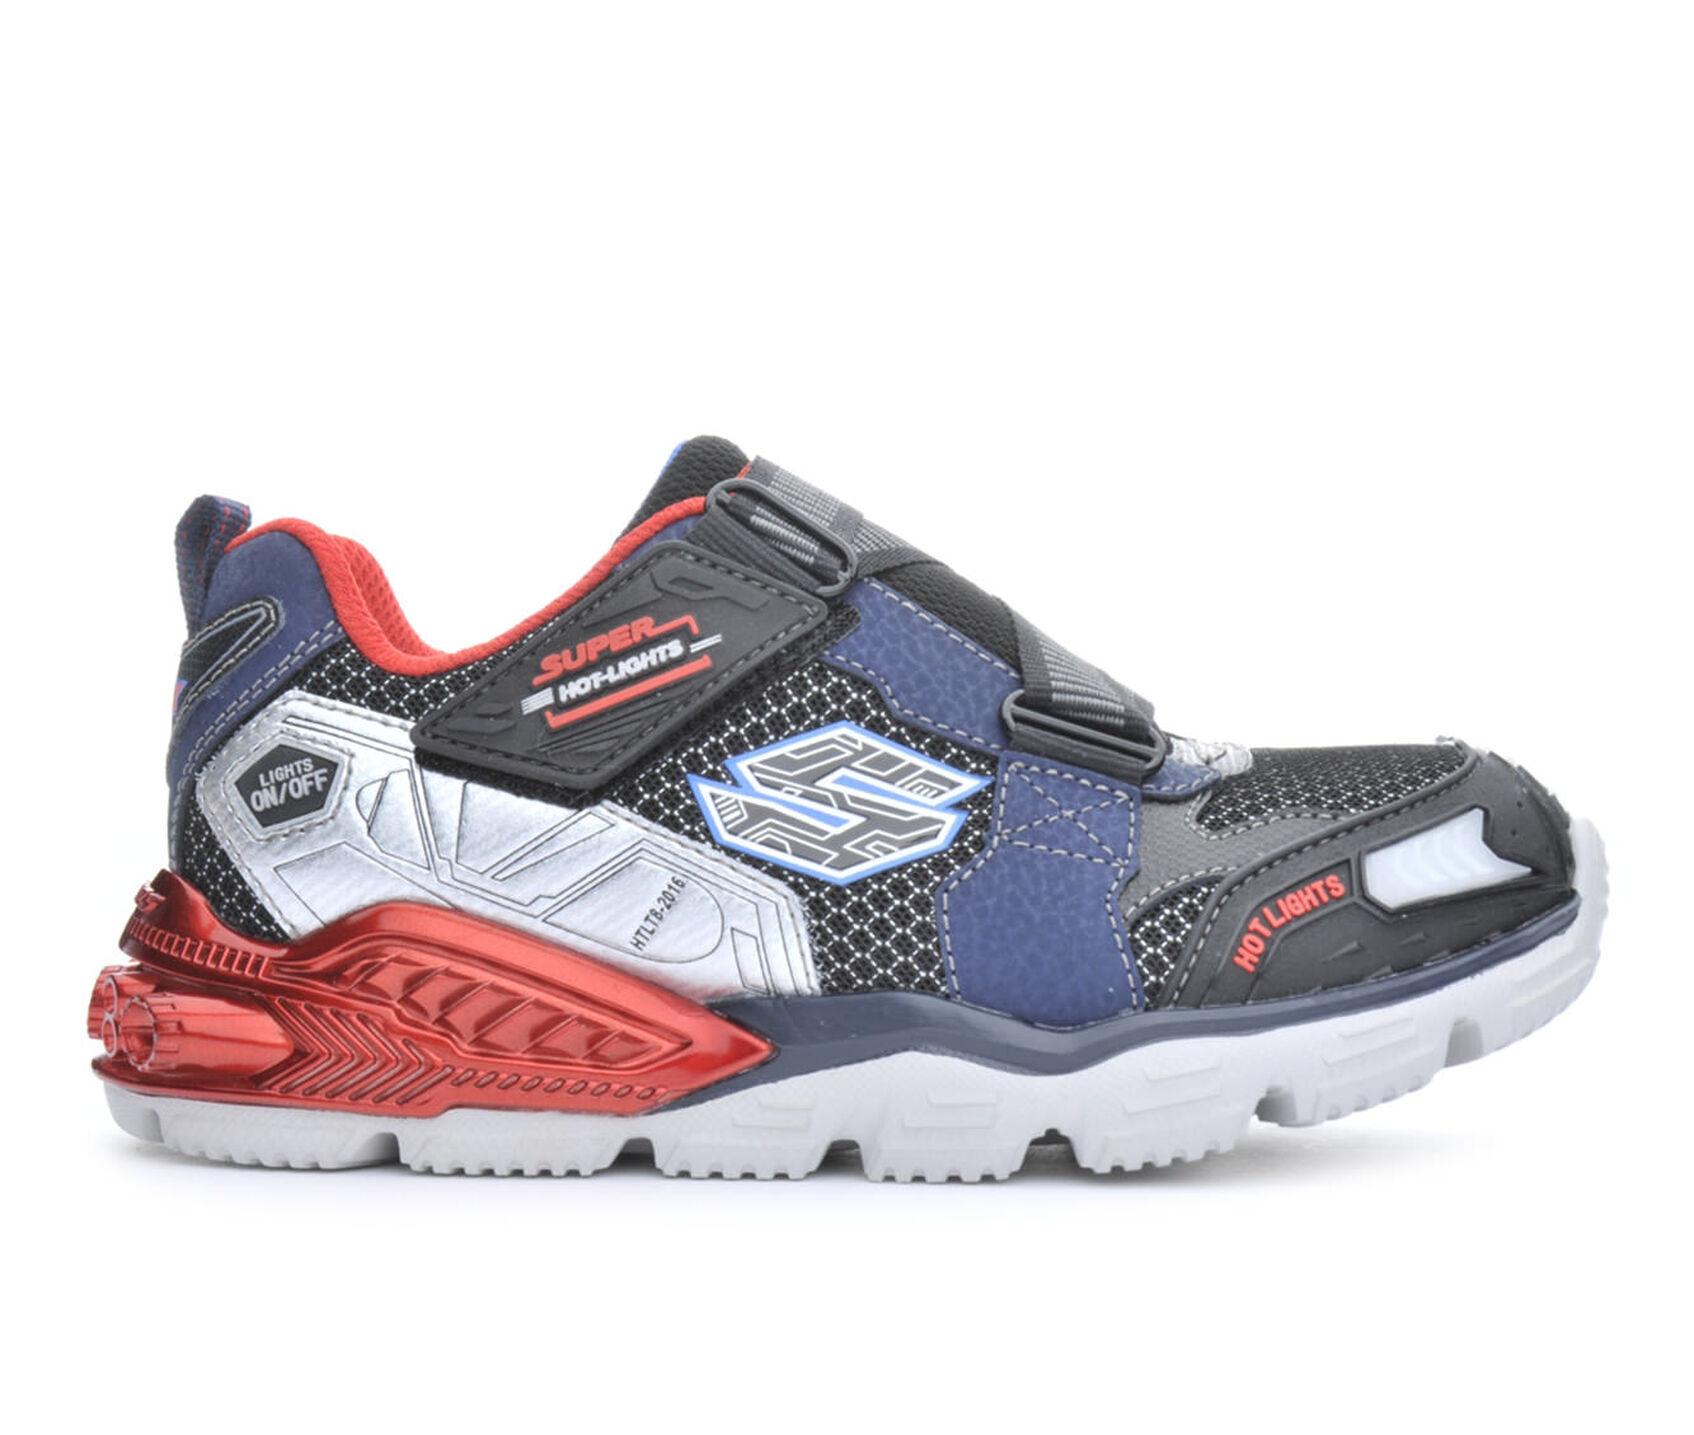 shoes best remote brands boys high led up light top red shop mens hoverboard